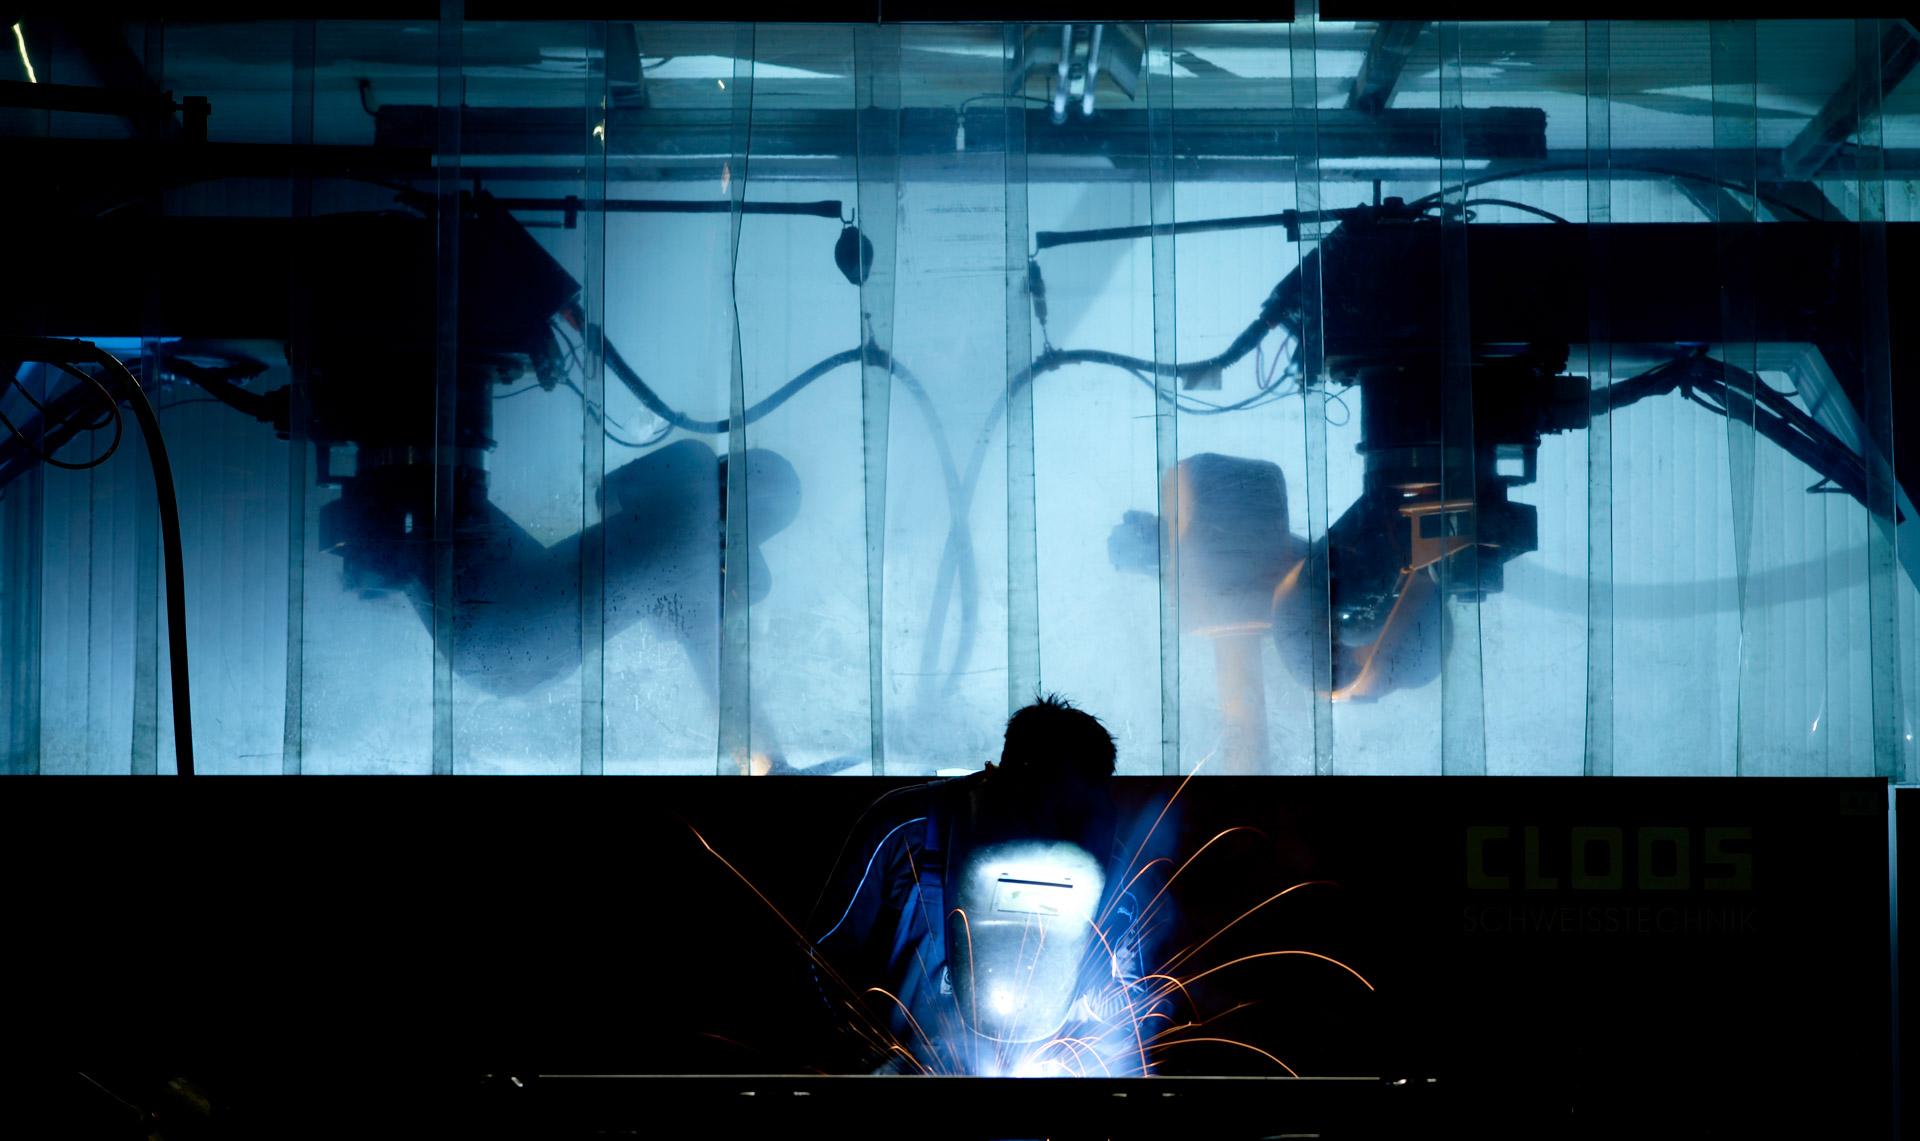 Glüpker Blechtechnologie: Schweißen / Welding